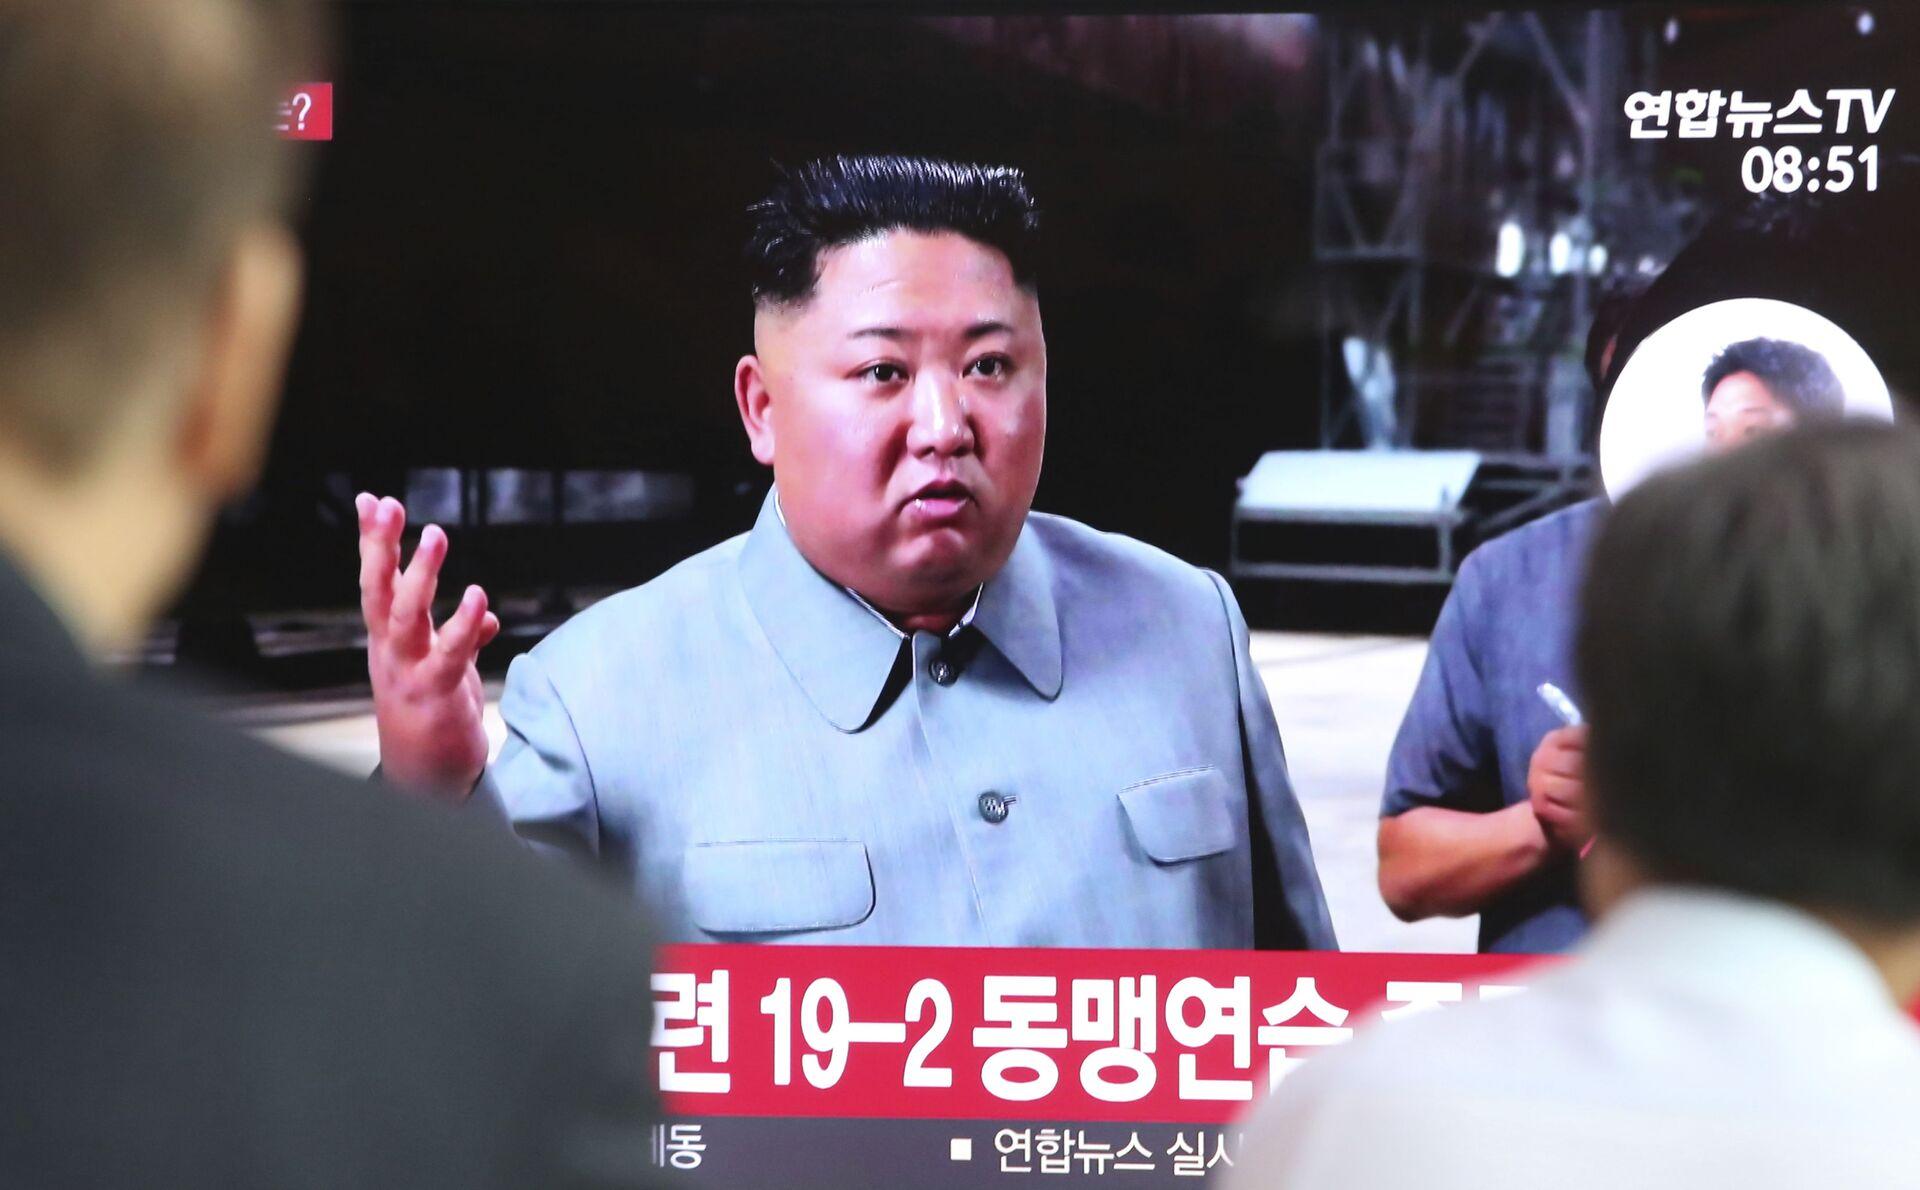 Kim Jong-un, líder de Corea del Norte  - Sputnik Mundo, 1920, 19.02.2021